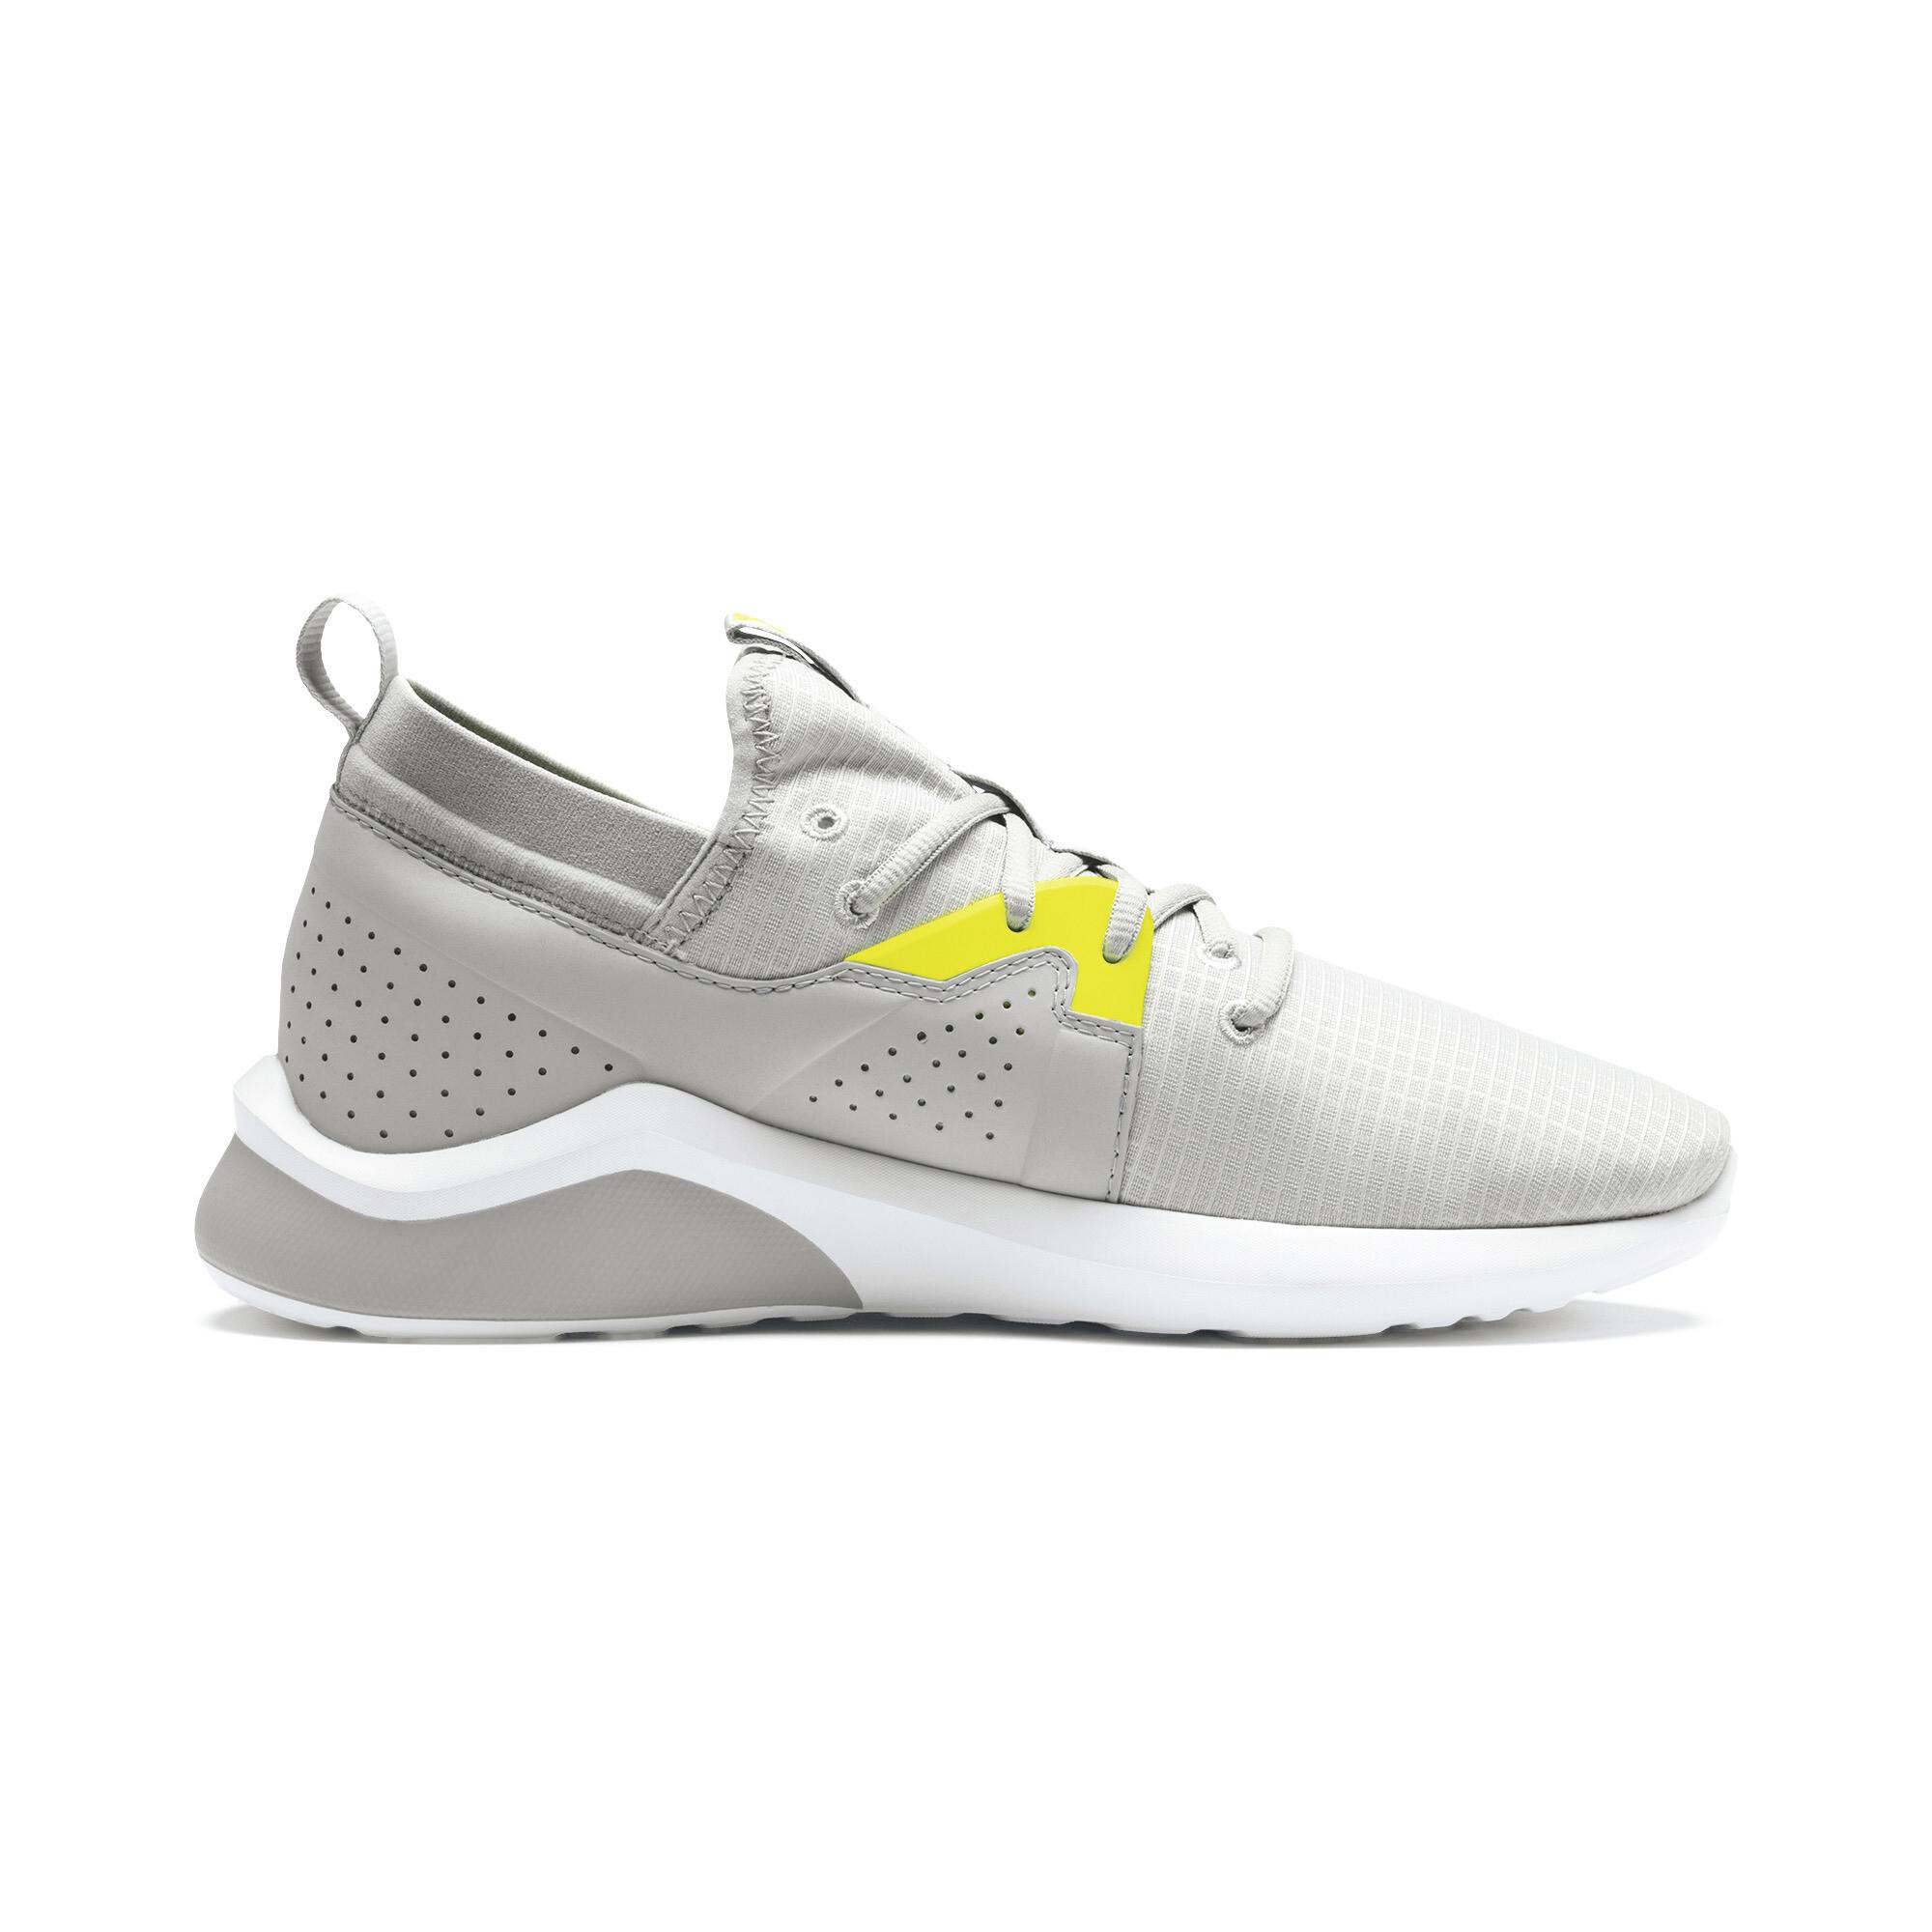 PUMA-Men-039-s-Emergence-Lights-Training-Shoes thumbnail 7